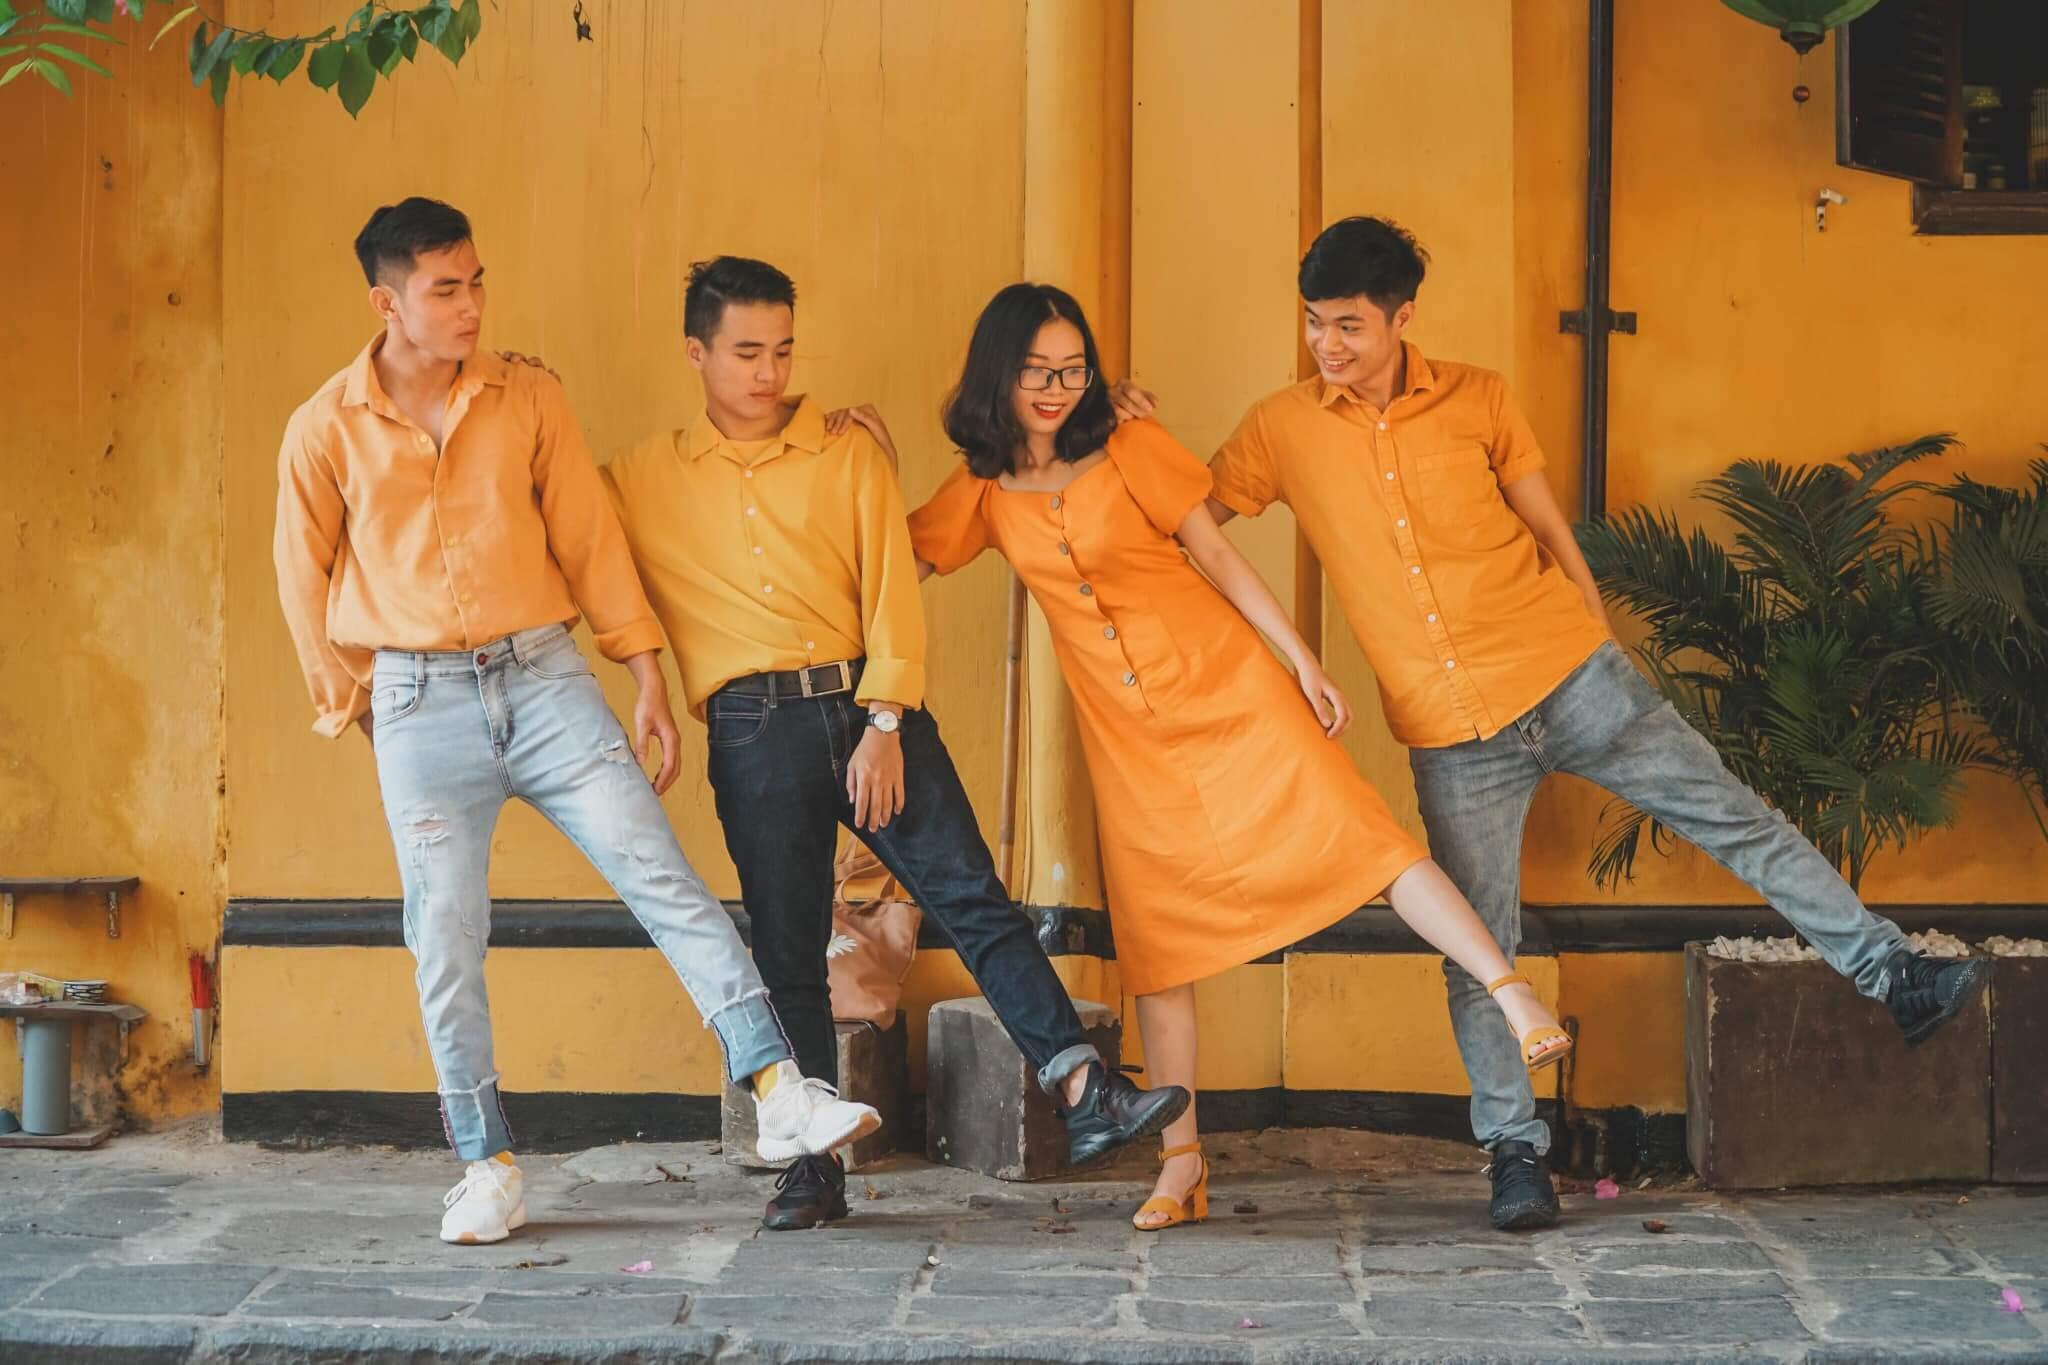 5n4d Cung Hoi Ban Cang Quet Da Nang Quang Nam Pho Coi Hoi An 07